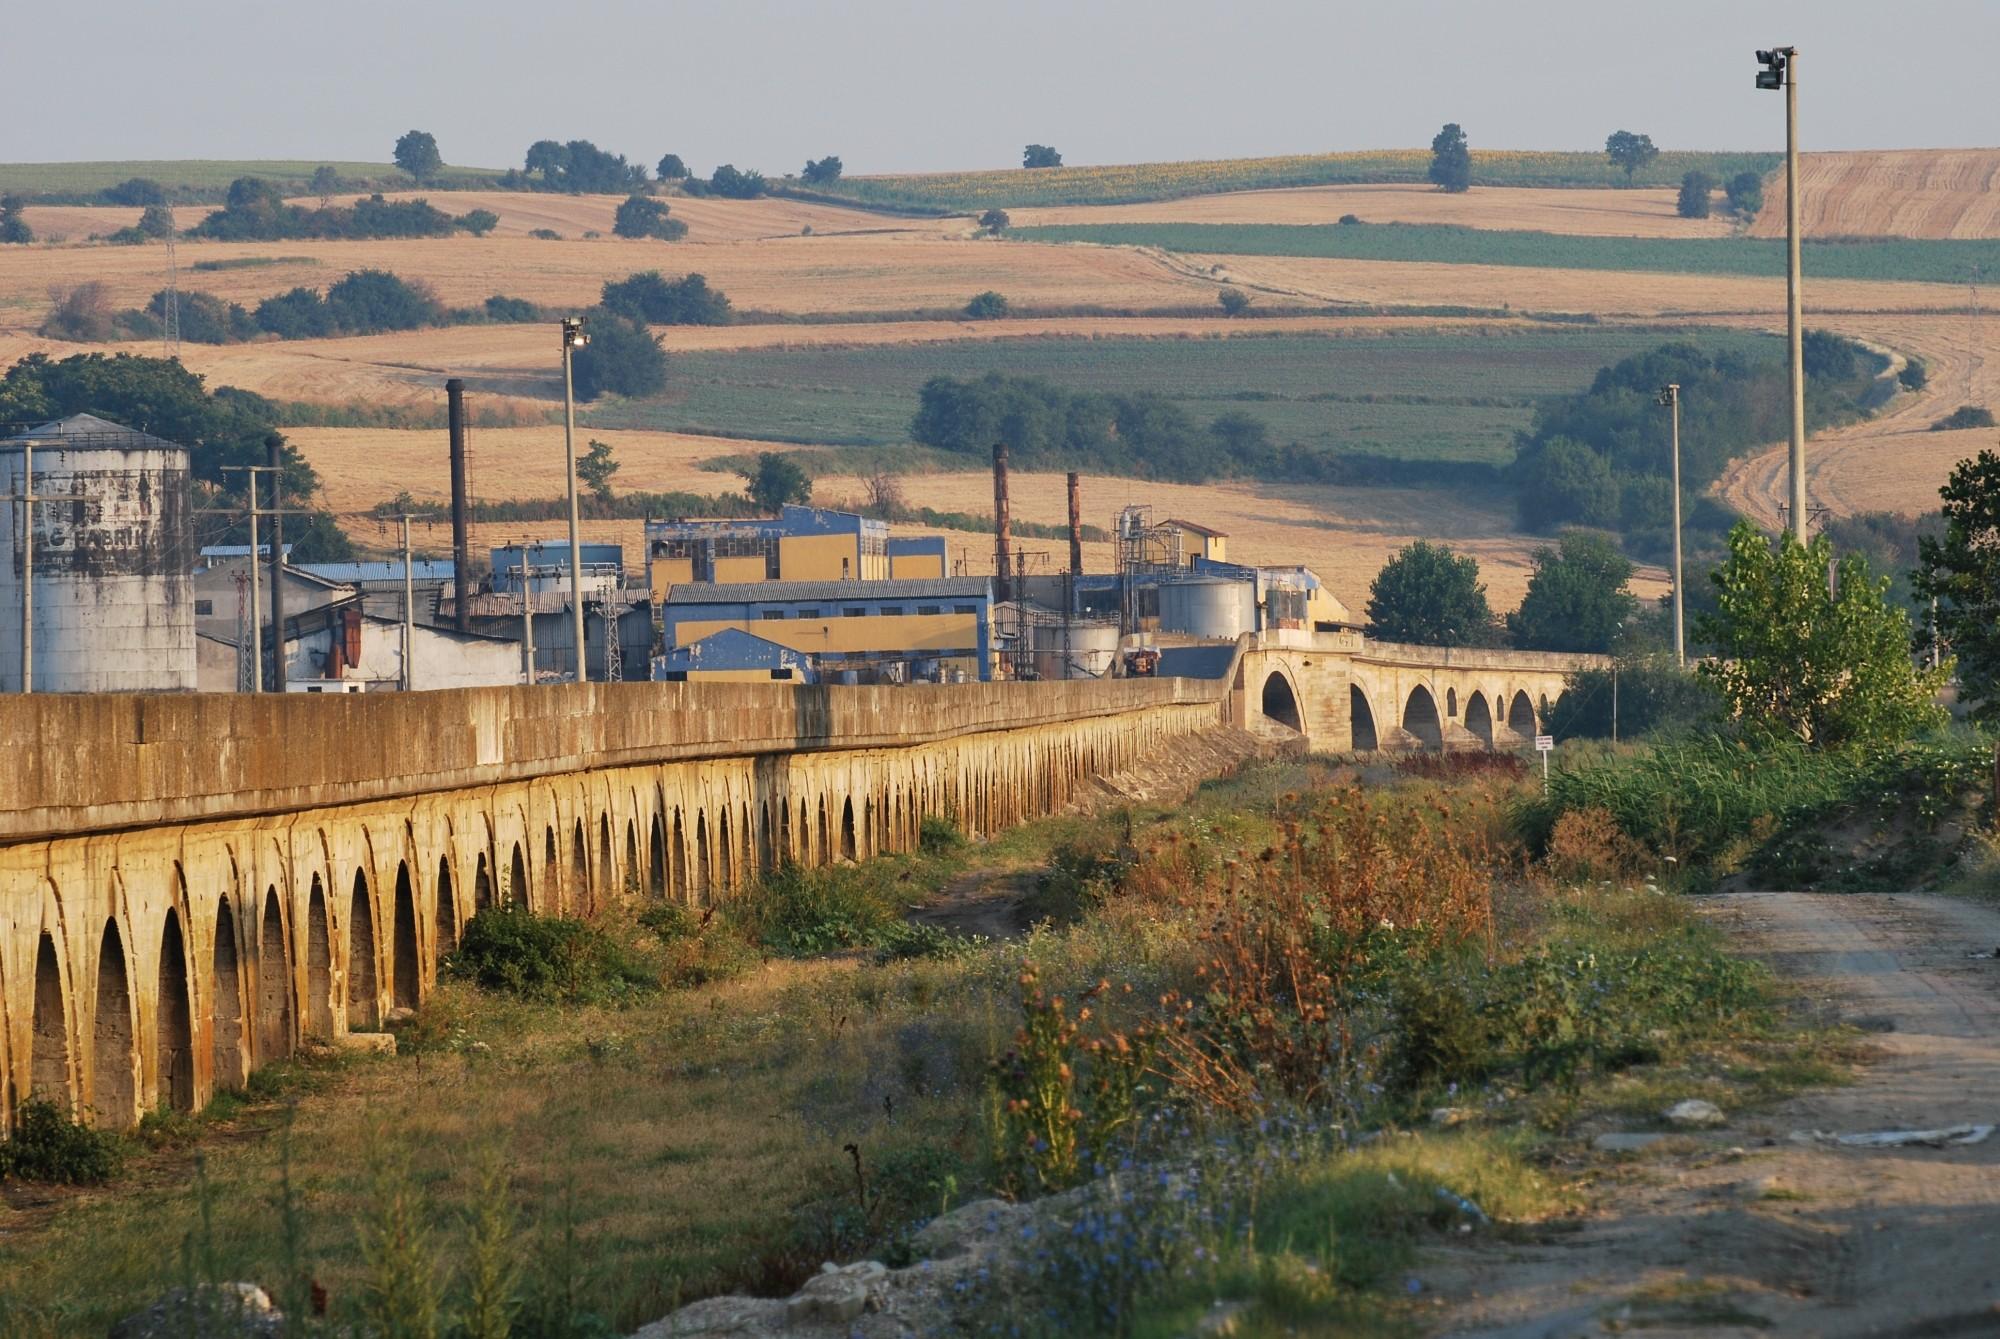 Uzunköprü Bridge - to be registered in the Guinness Book of World Records